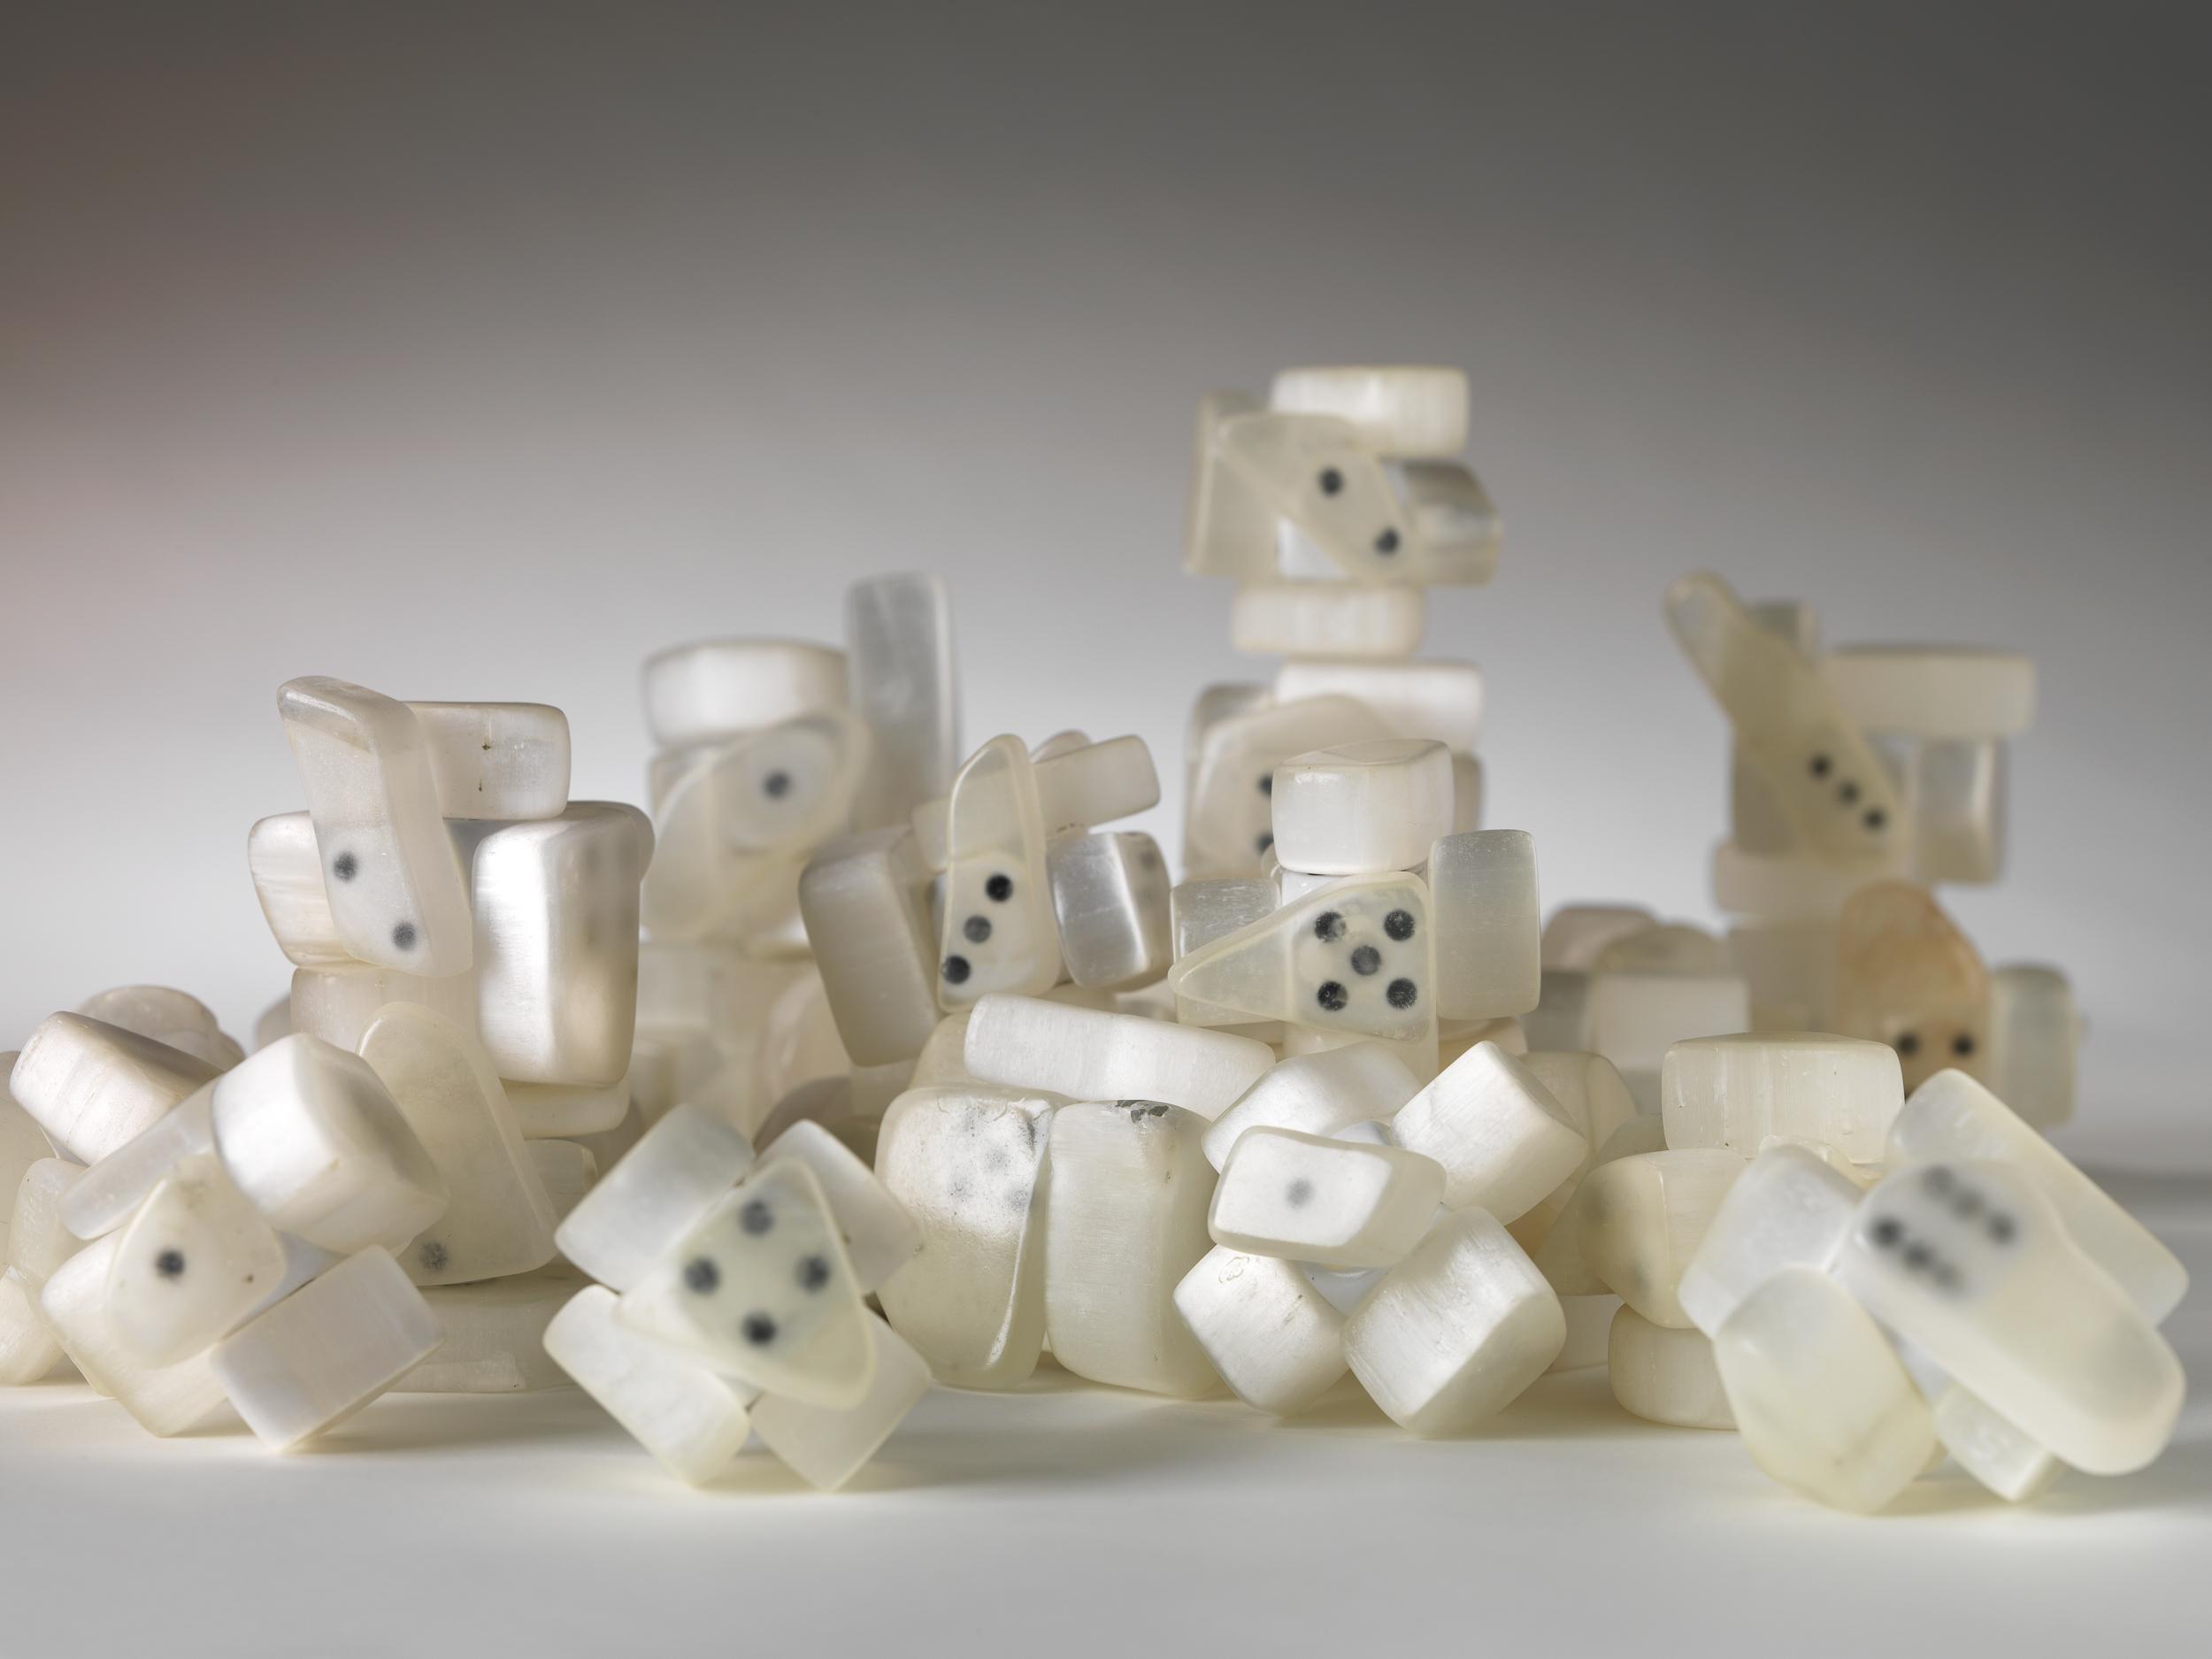 Untitled [dice] 2011  Hubert Duprat (Nérac, France, 1957) Ulexite, plastic dice, glue